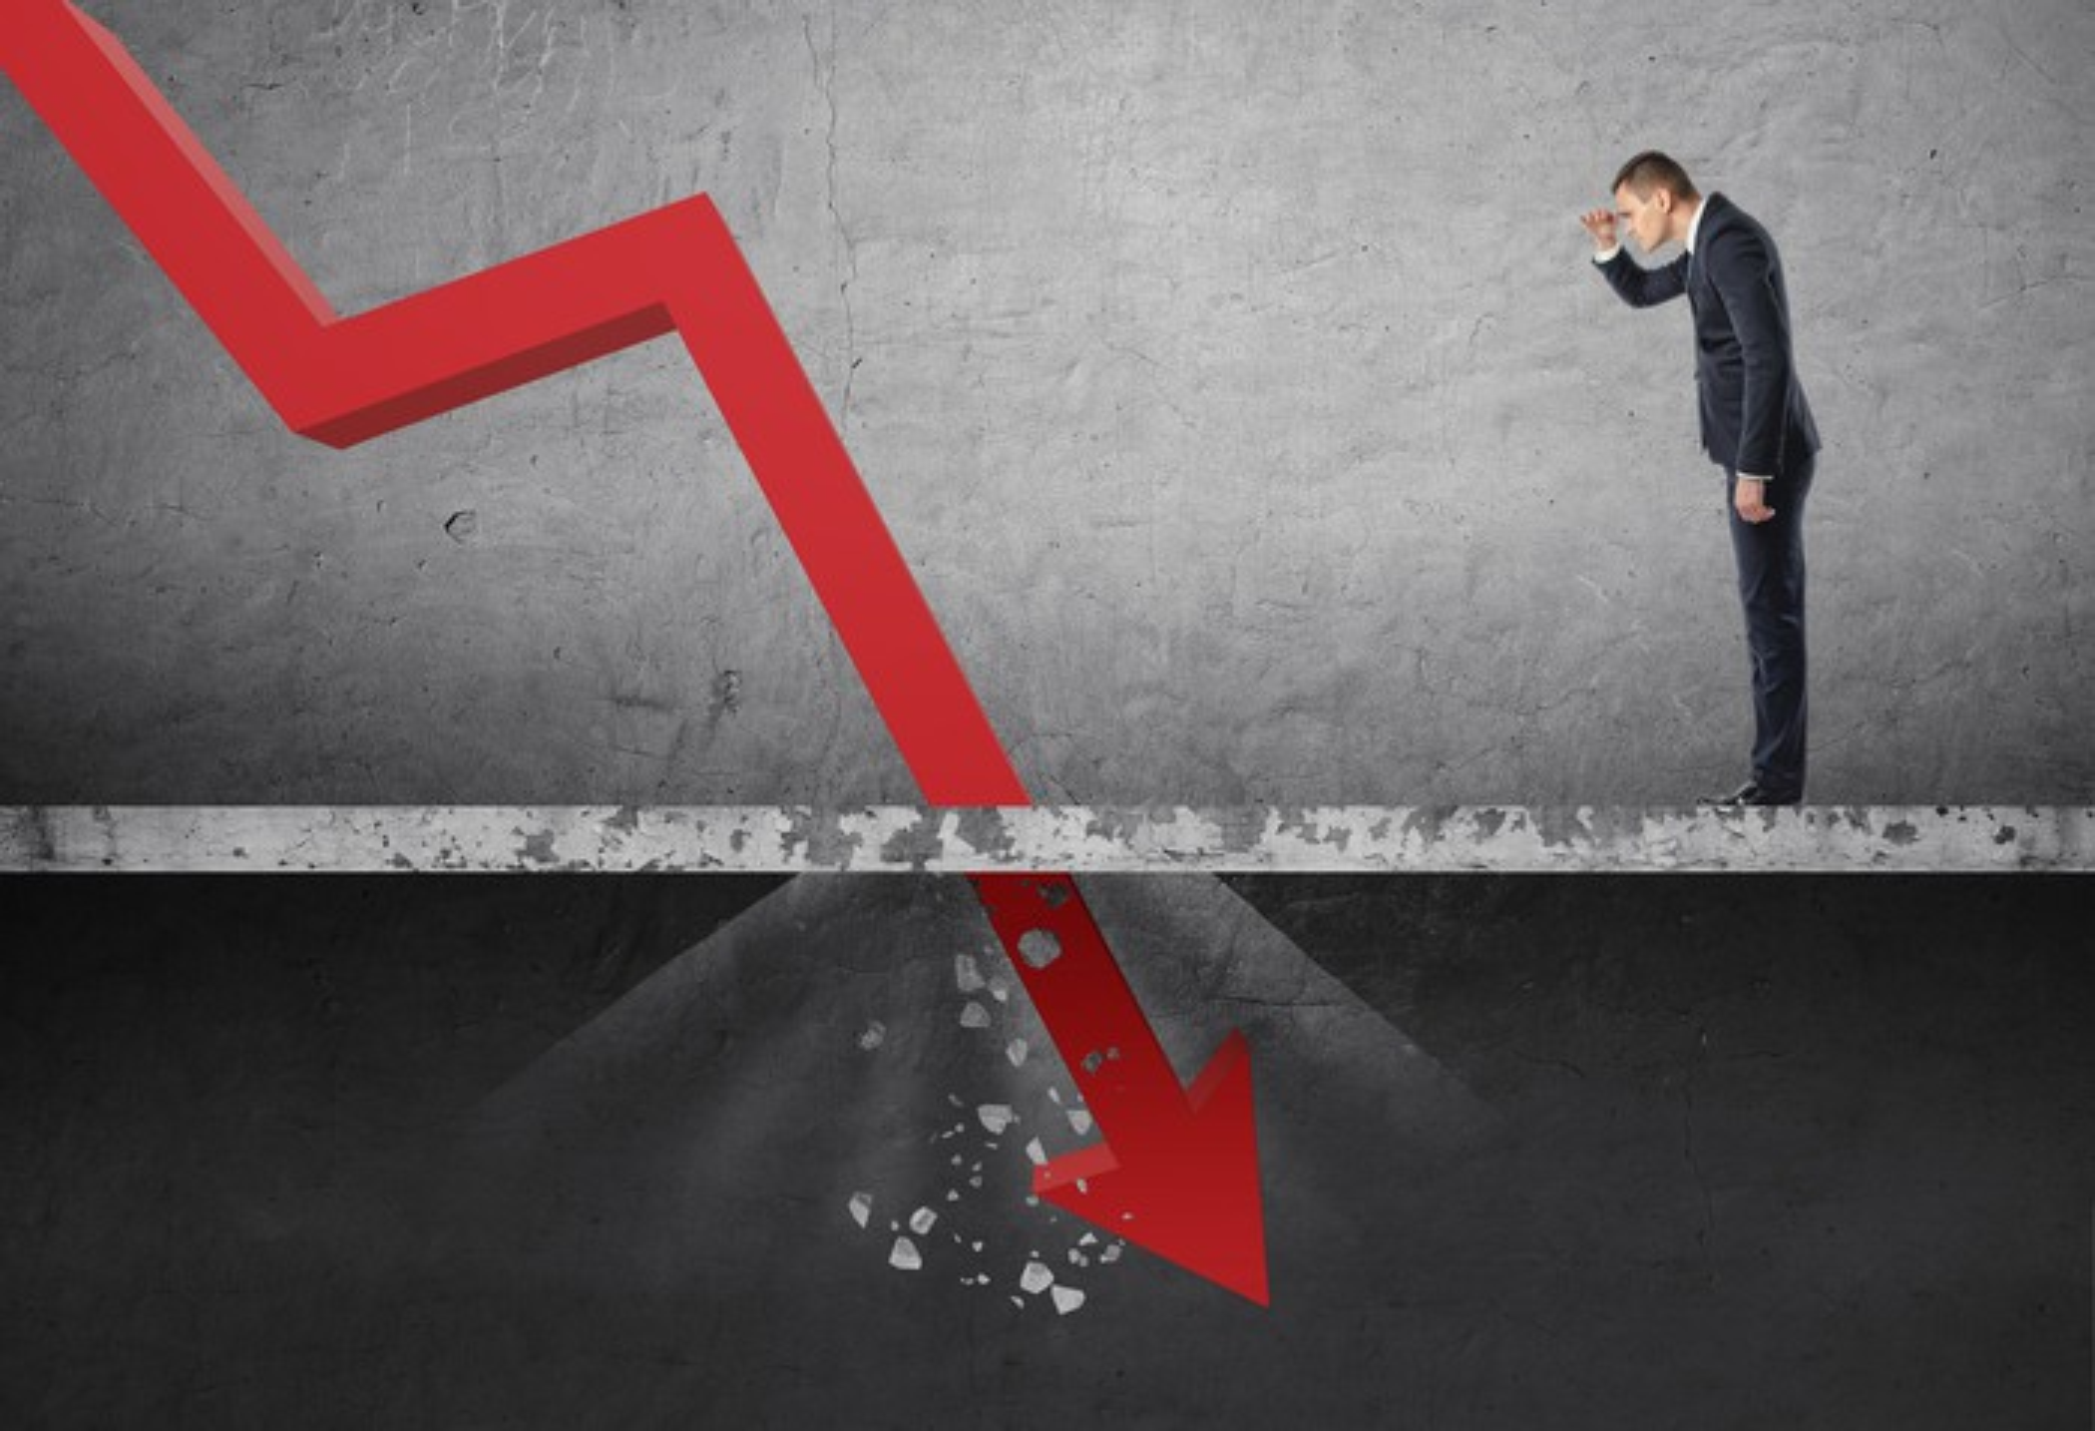 A businessman watches a chart crash through the floor.